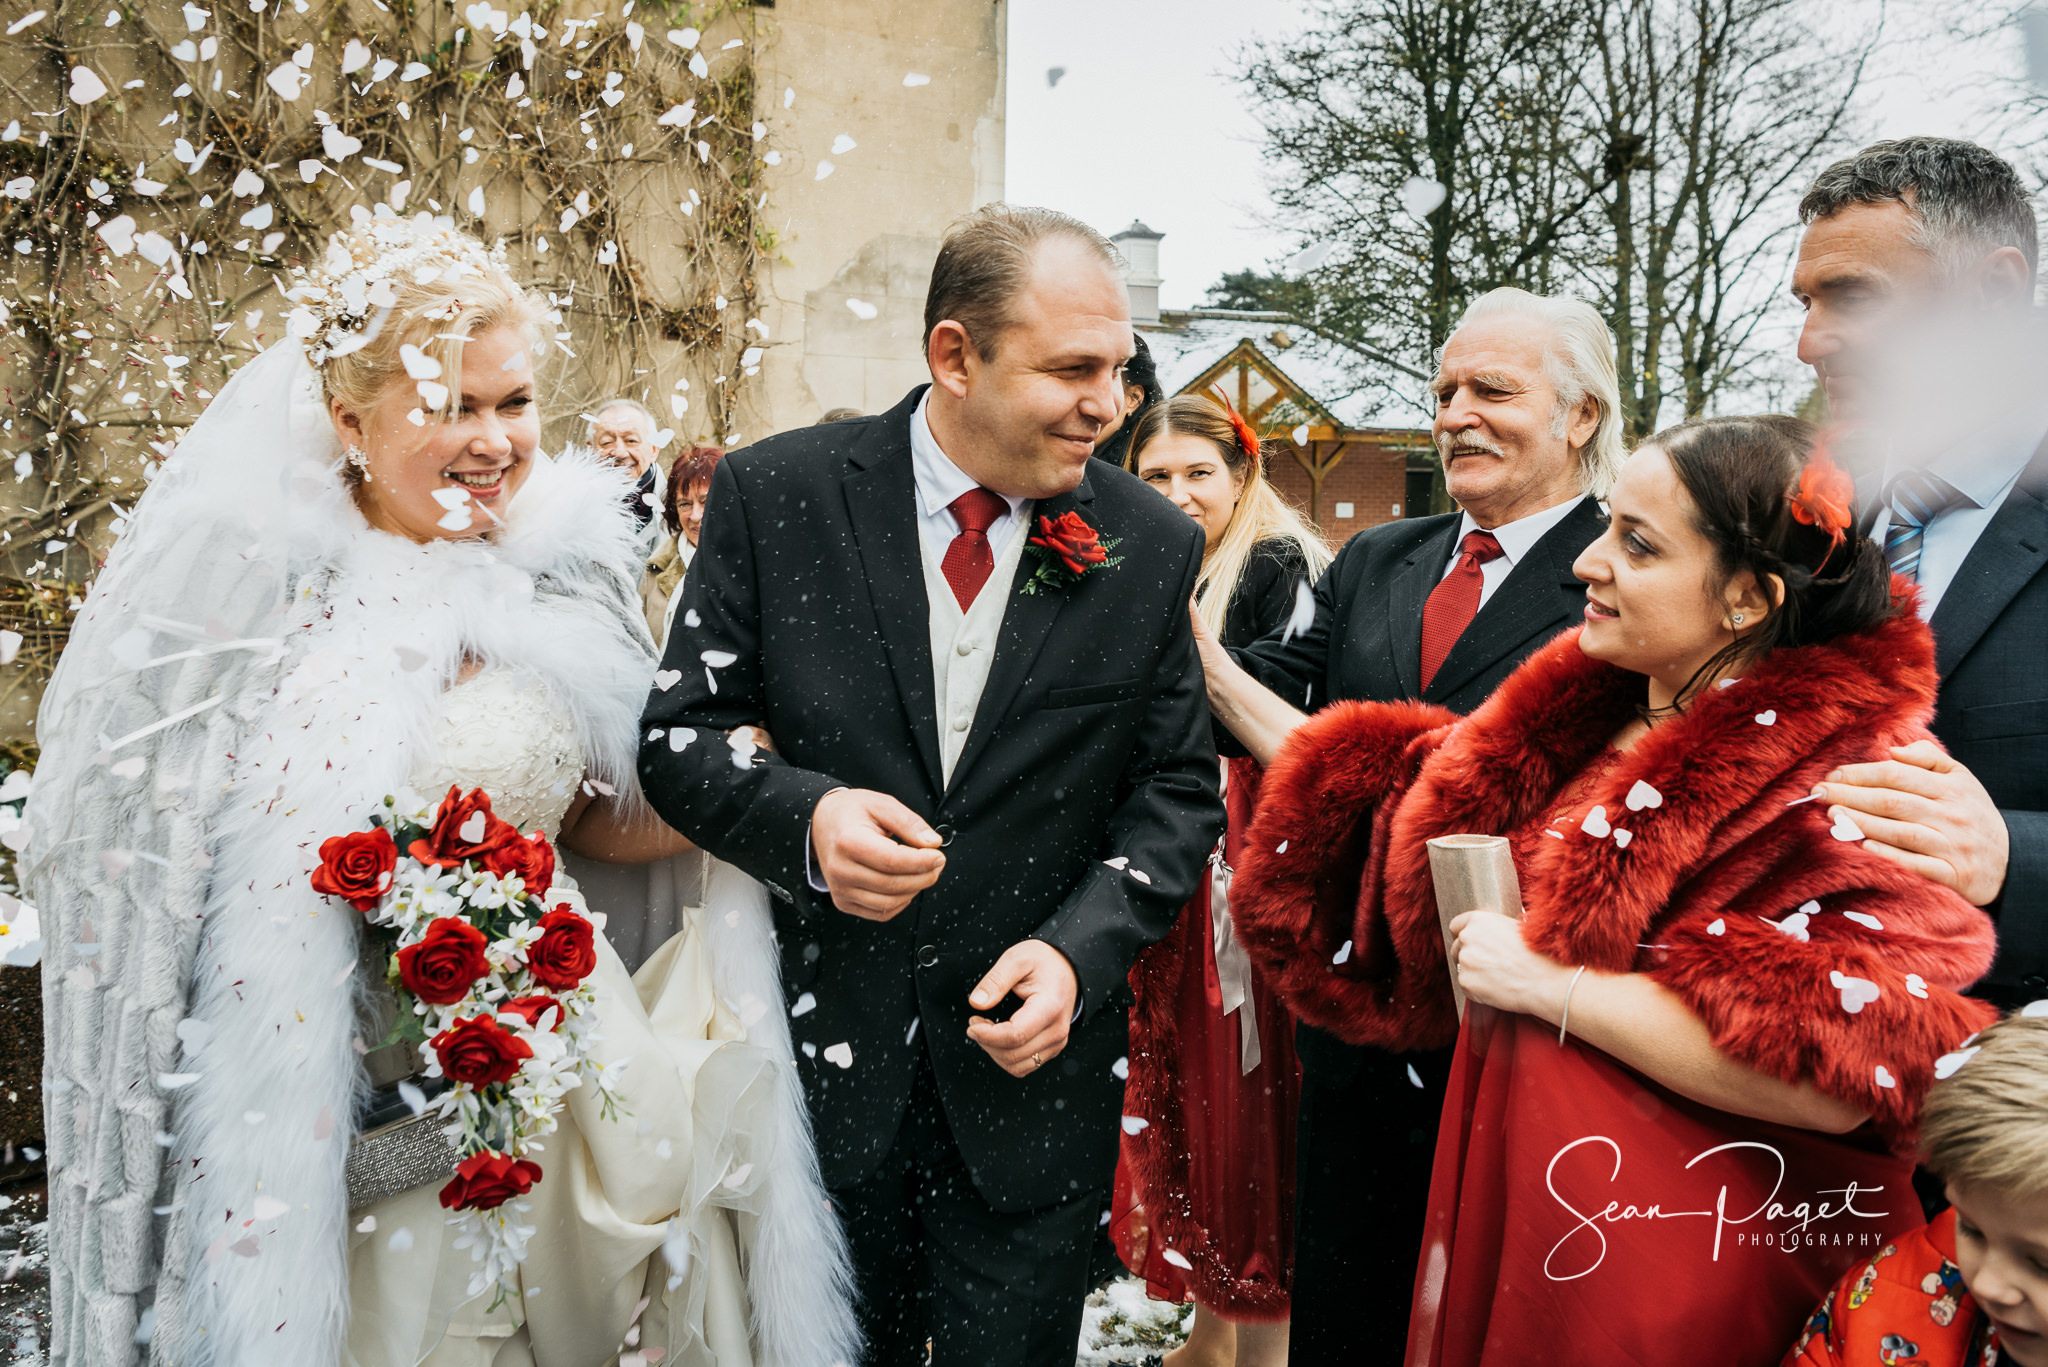 Chesford Grange Kenilworth Wedding Photography